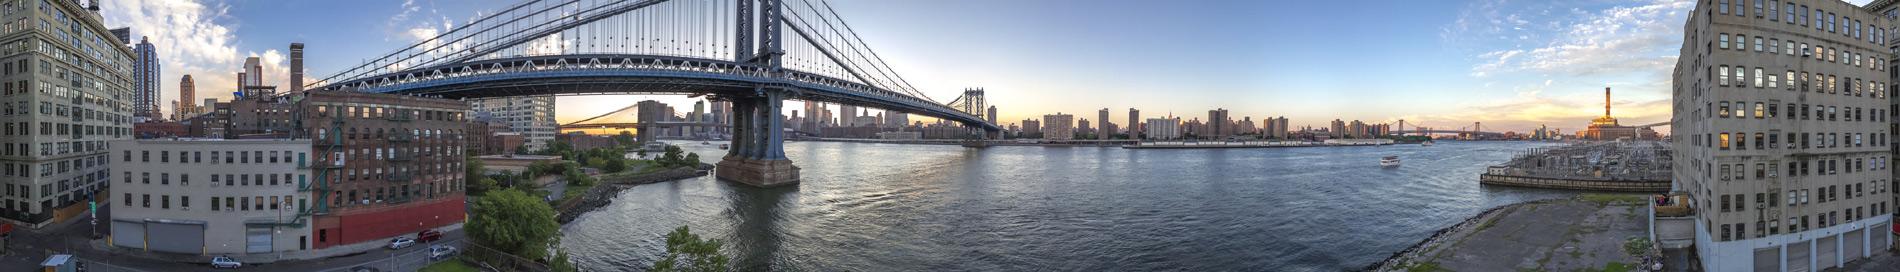 BrooklynNYAerialViewpanos